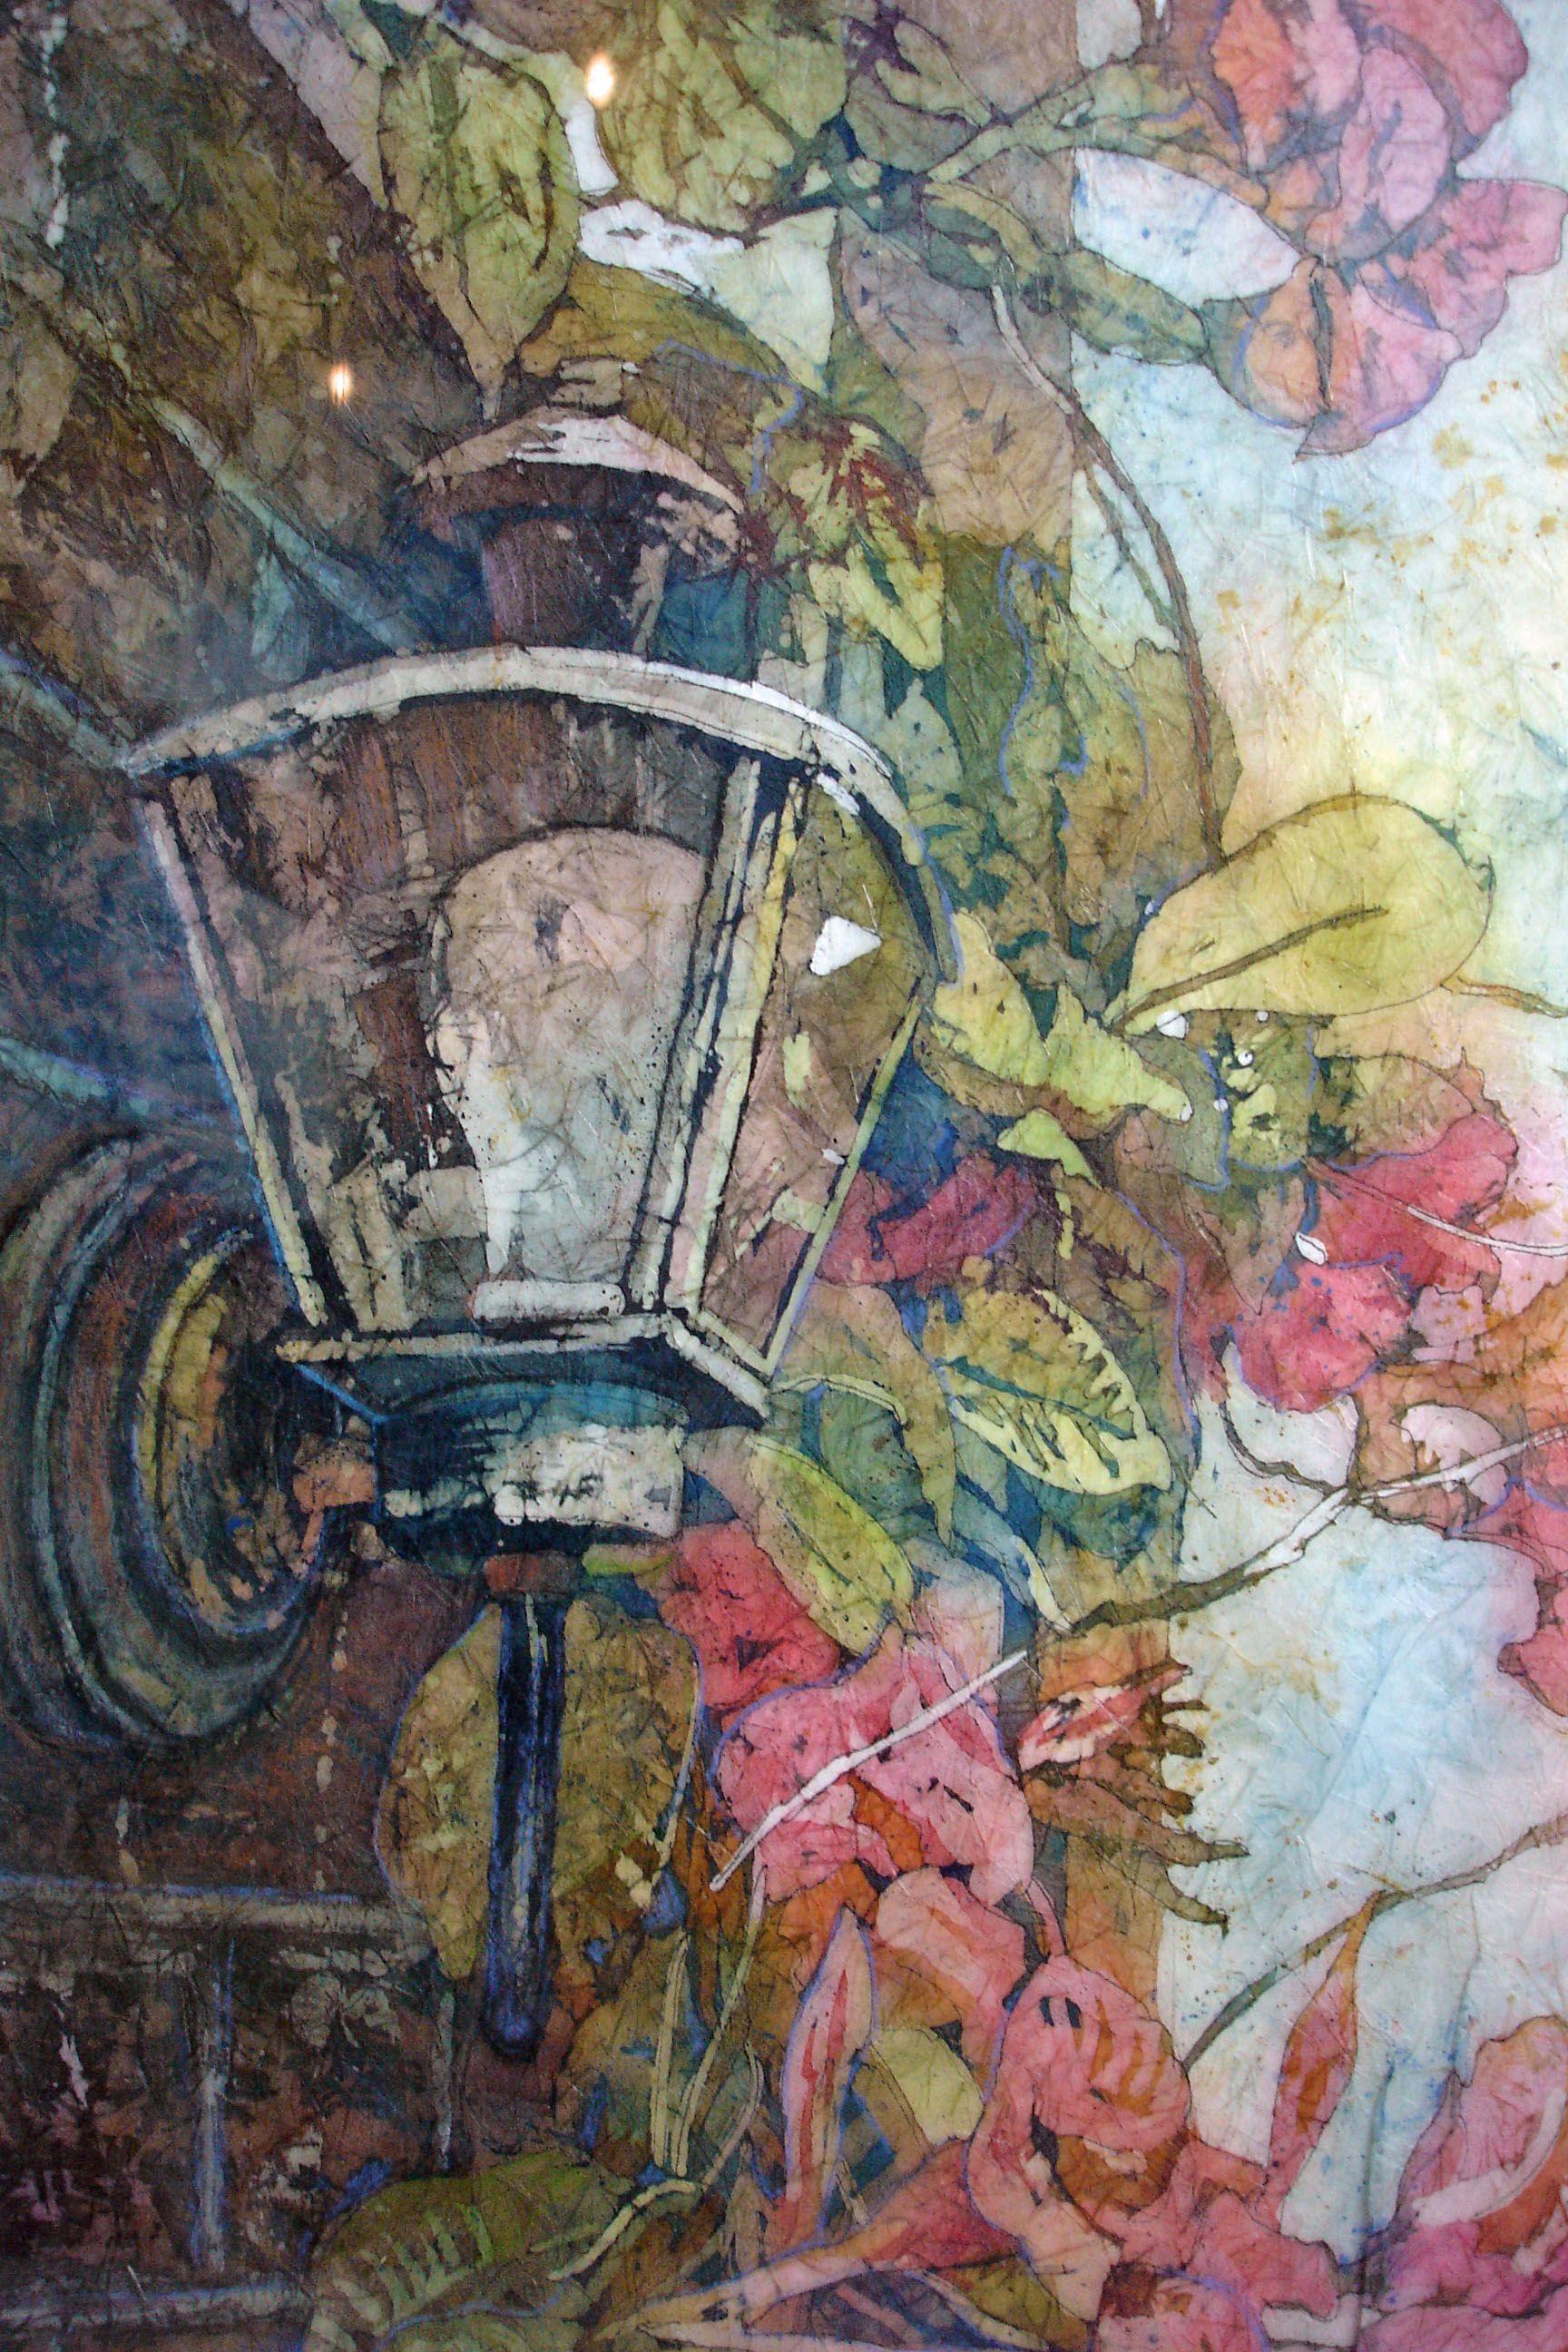 Lamp post | Art: Watercolor 2 | Pinterest | Watercolor, Light art ... for Lamp Post Painting  299kxo